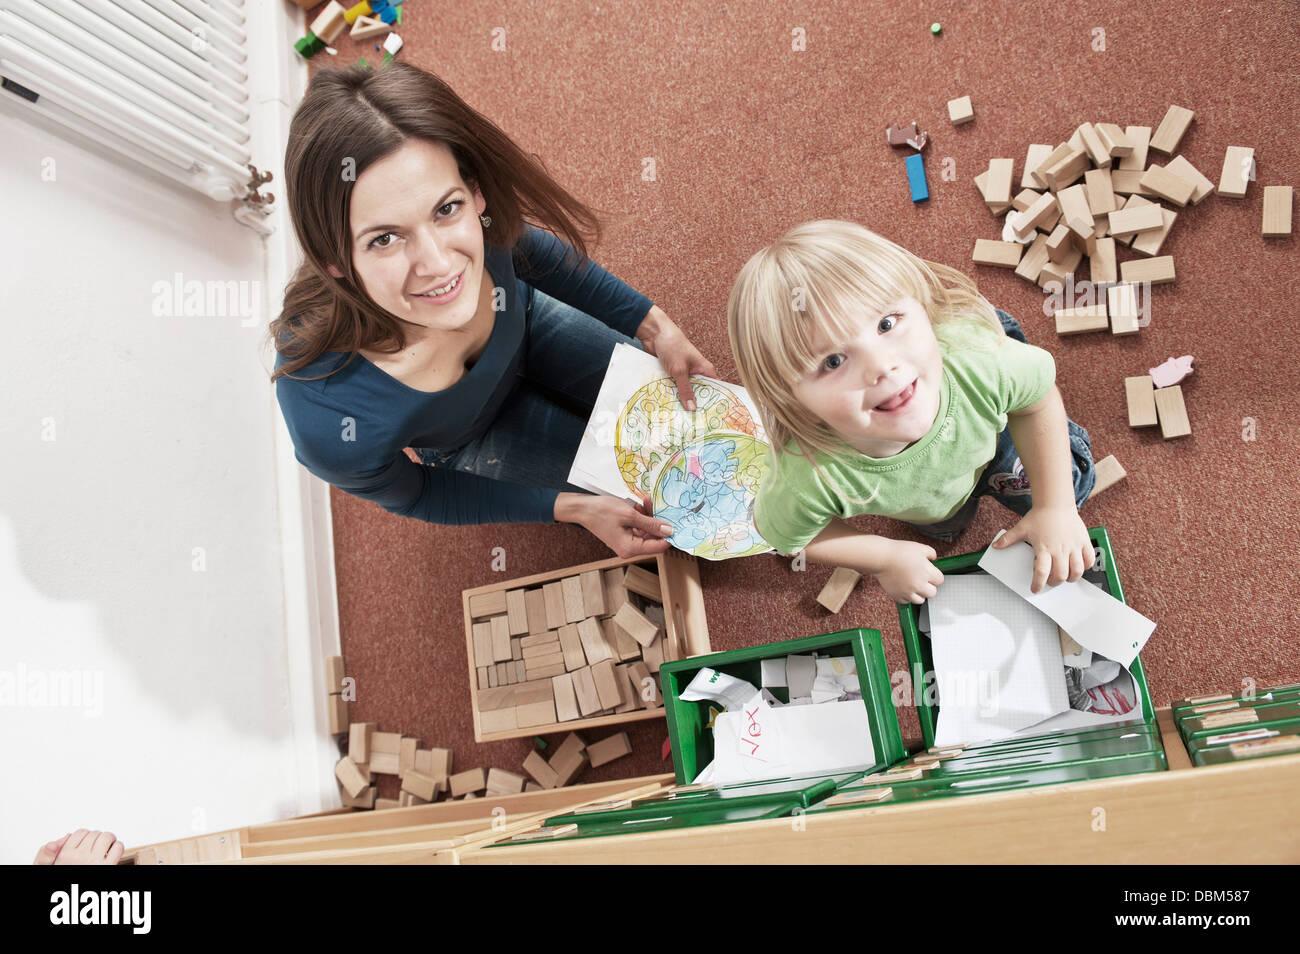 Female Carer And Boy In Nursery School, Kottgeisering, Bavaria, Germany, Europe - Stock Image